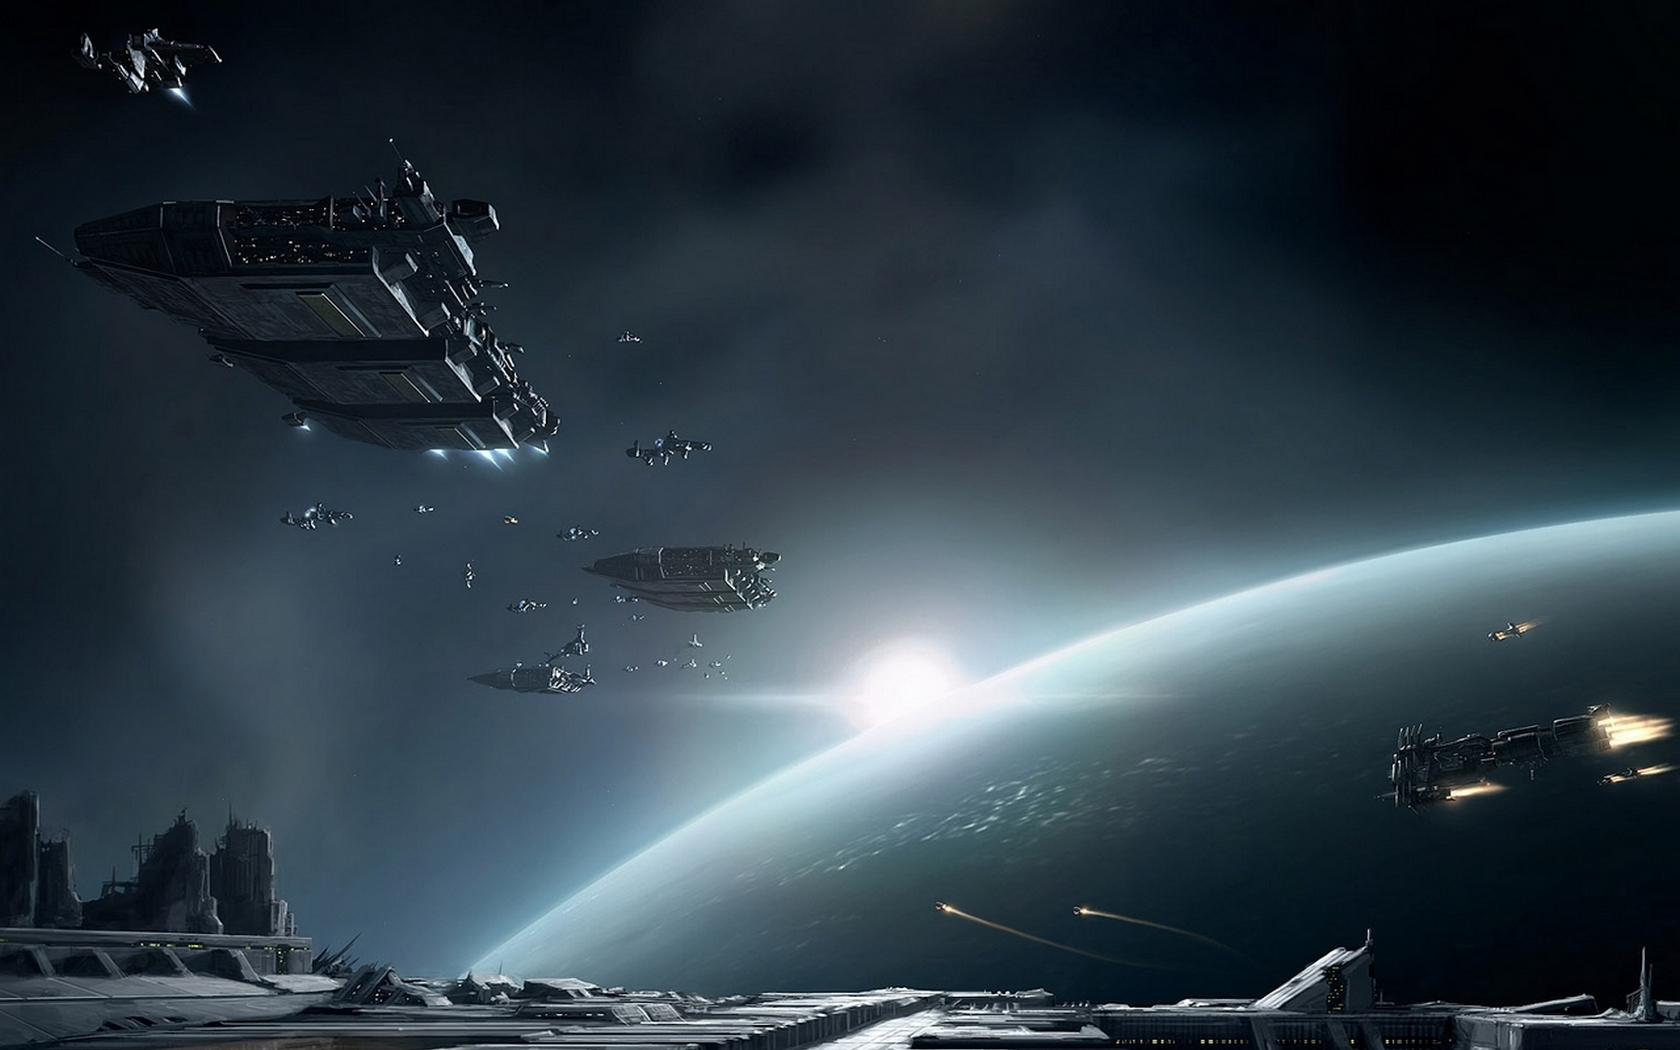 Free Sci Fi Fantasy Desktop Wallpaper: Science Fiction Wallpapers